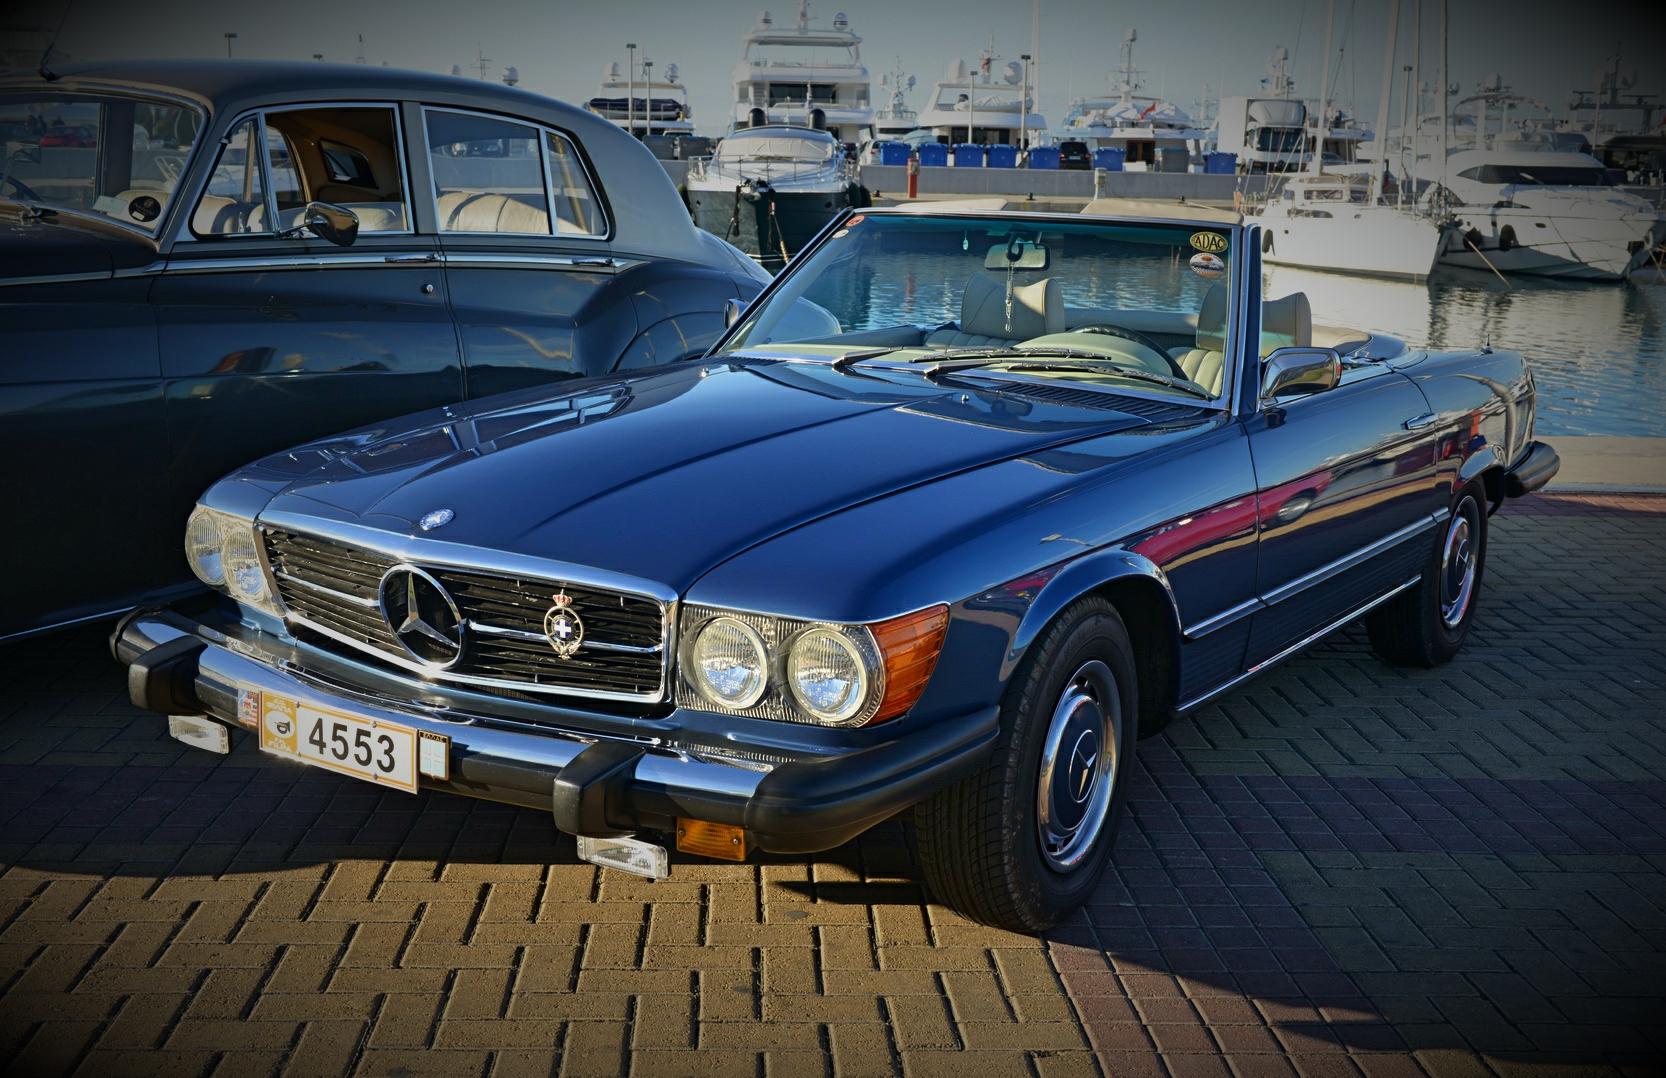 1975 MERCEDES 450SL